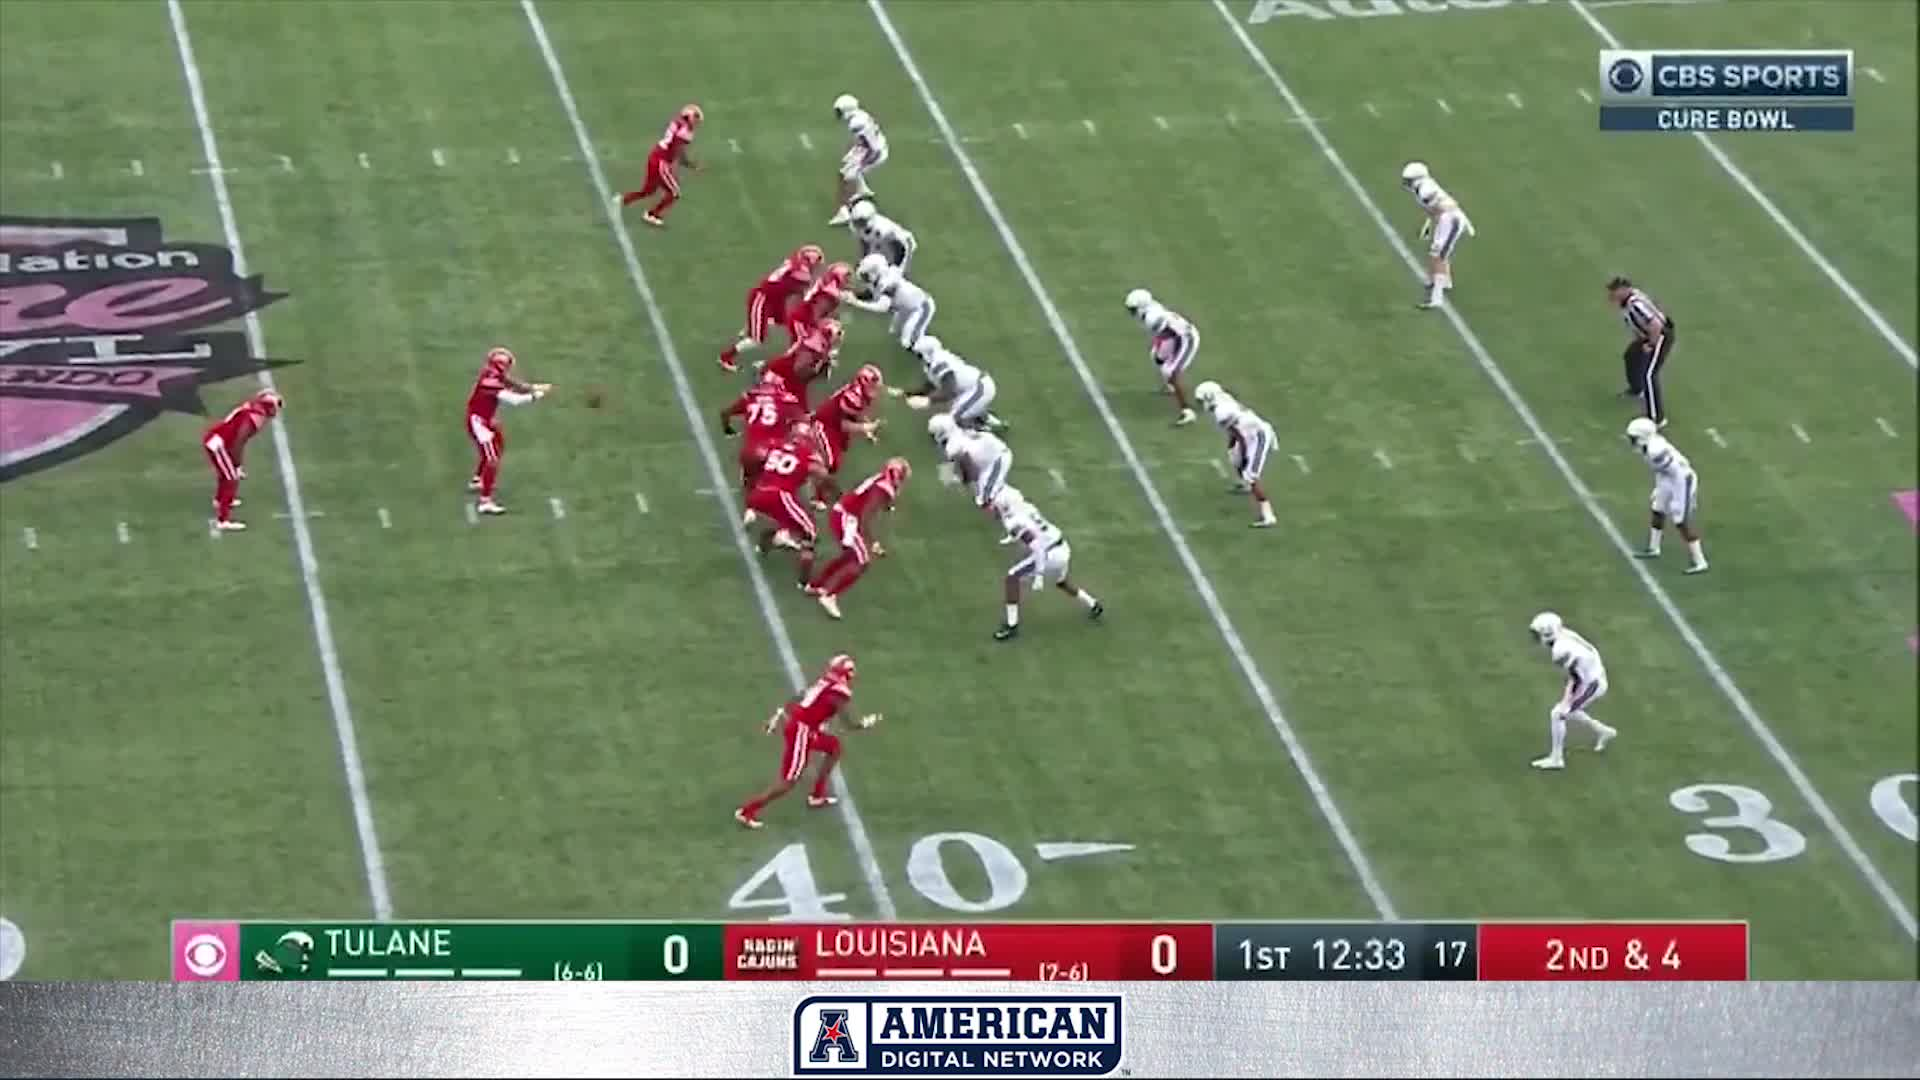 2170a02de 2018 American Football Highlights - AutoNation Cure Bowl Tulane 41